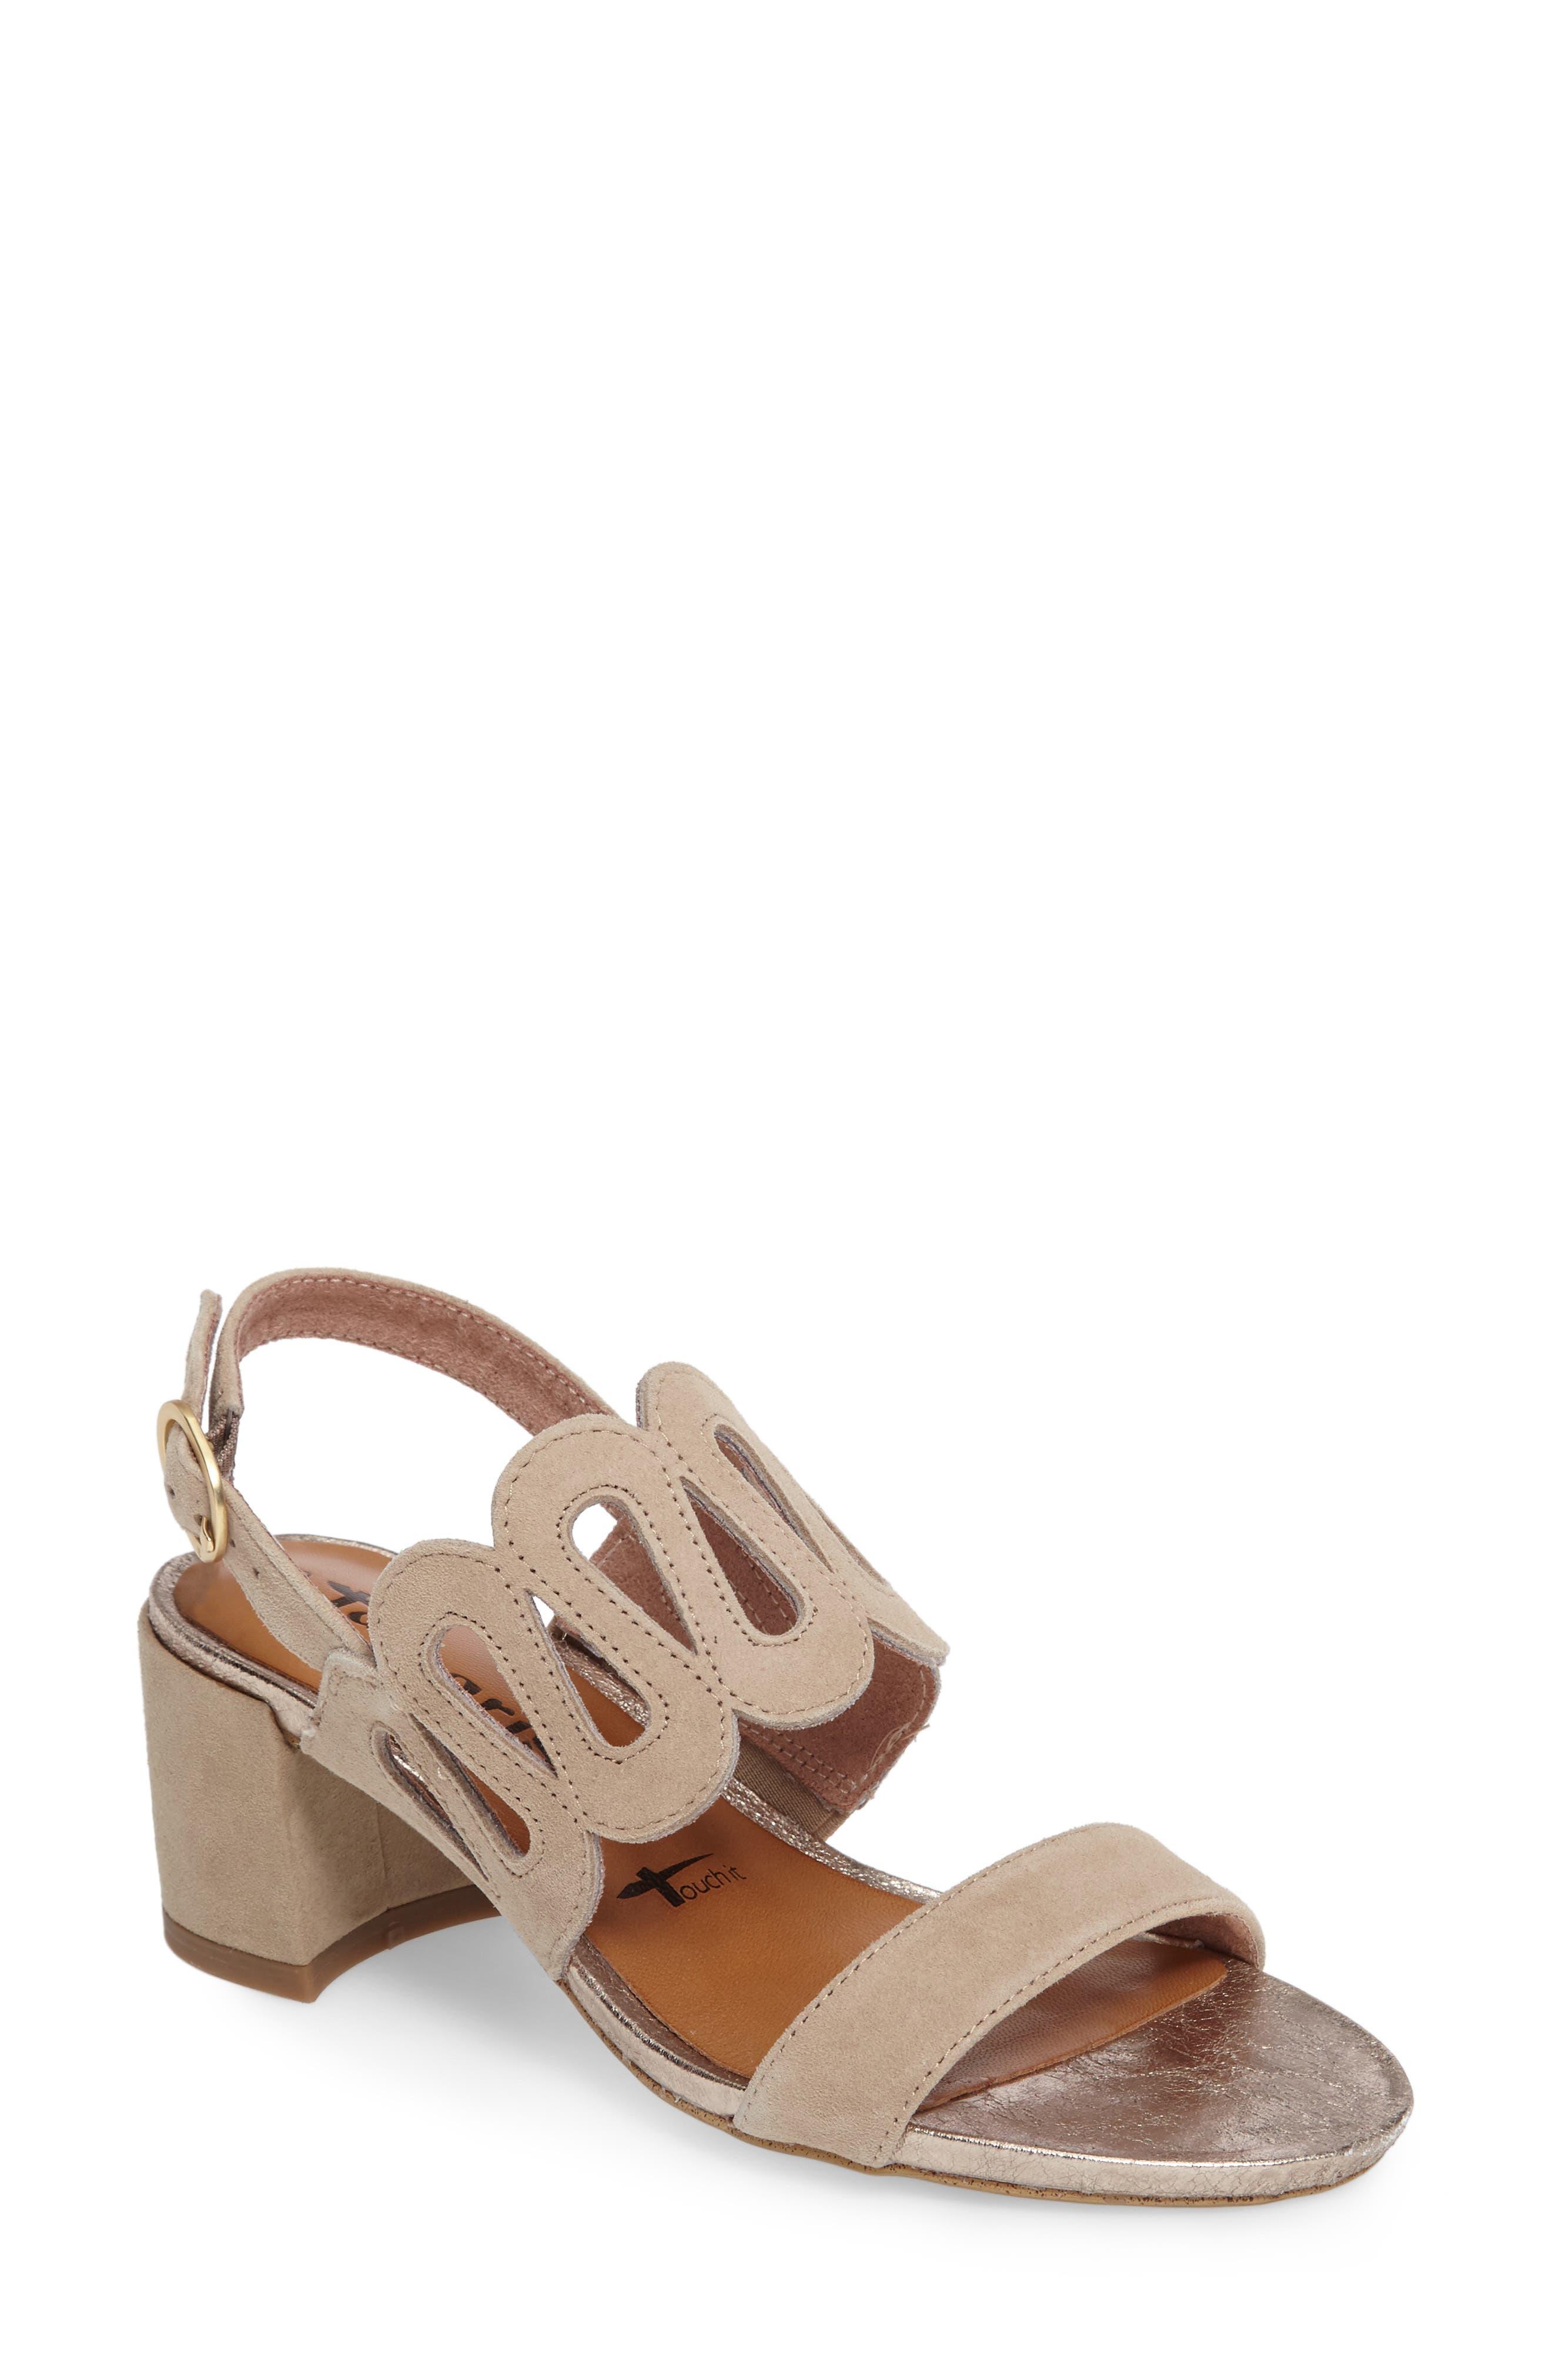 TAMARIS Philis Block Heel Sandal